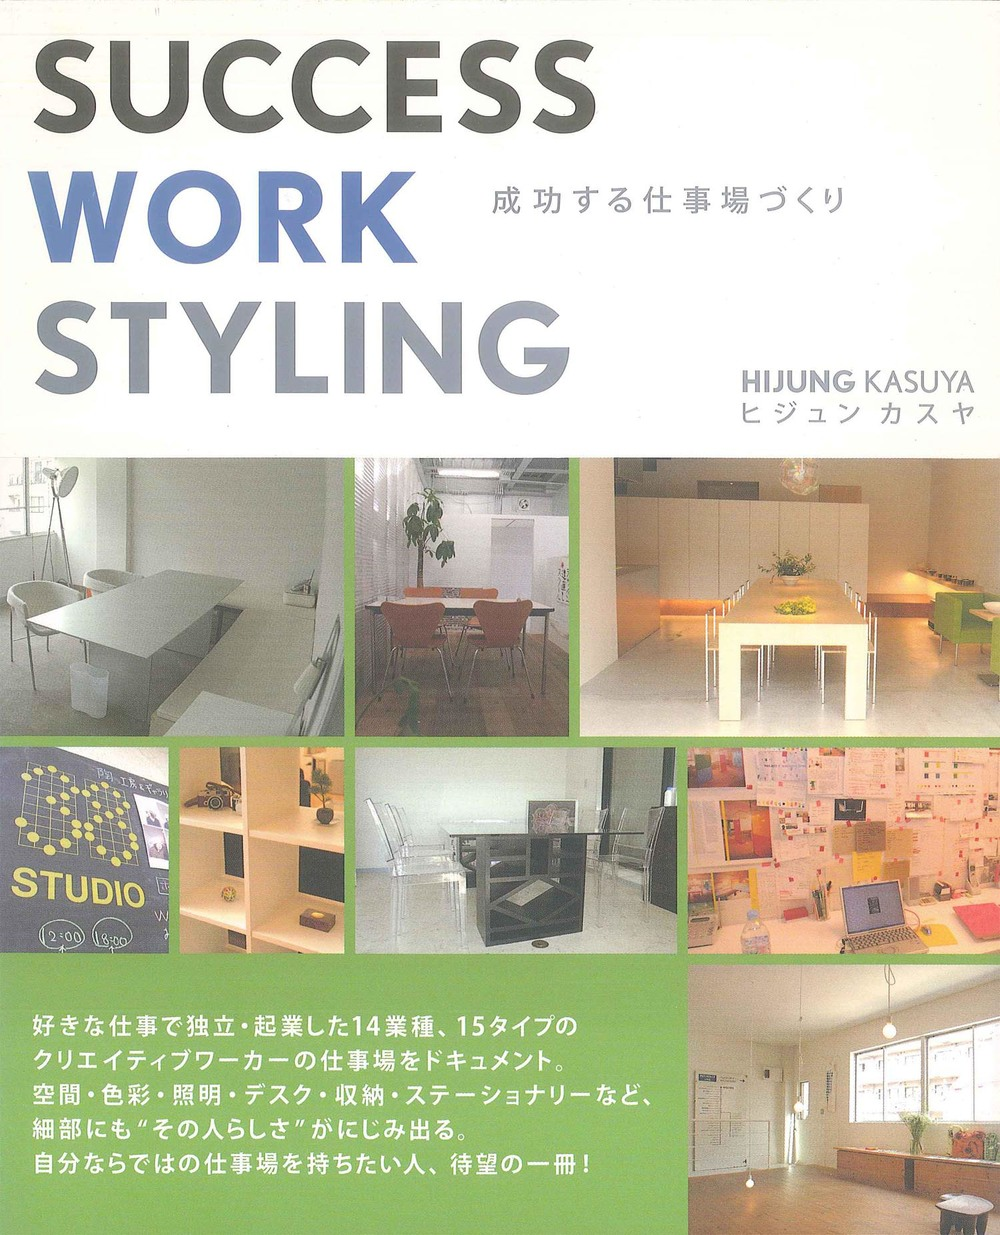 Emmanuelle's studio